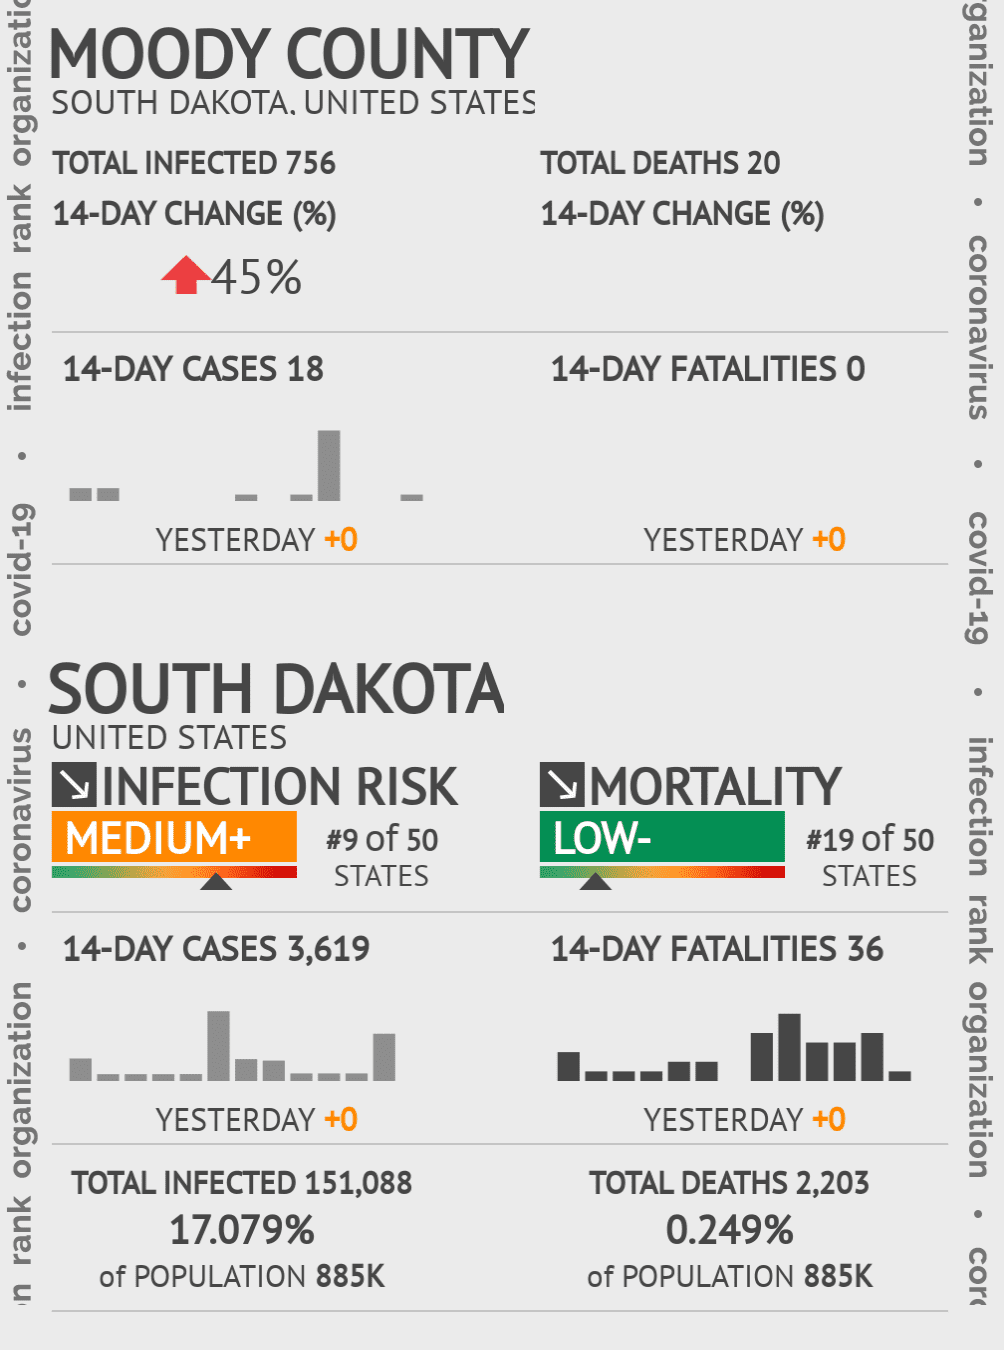 Moody County Coronavirus Covid-19 Risk of Infection on July 24, 2021